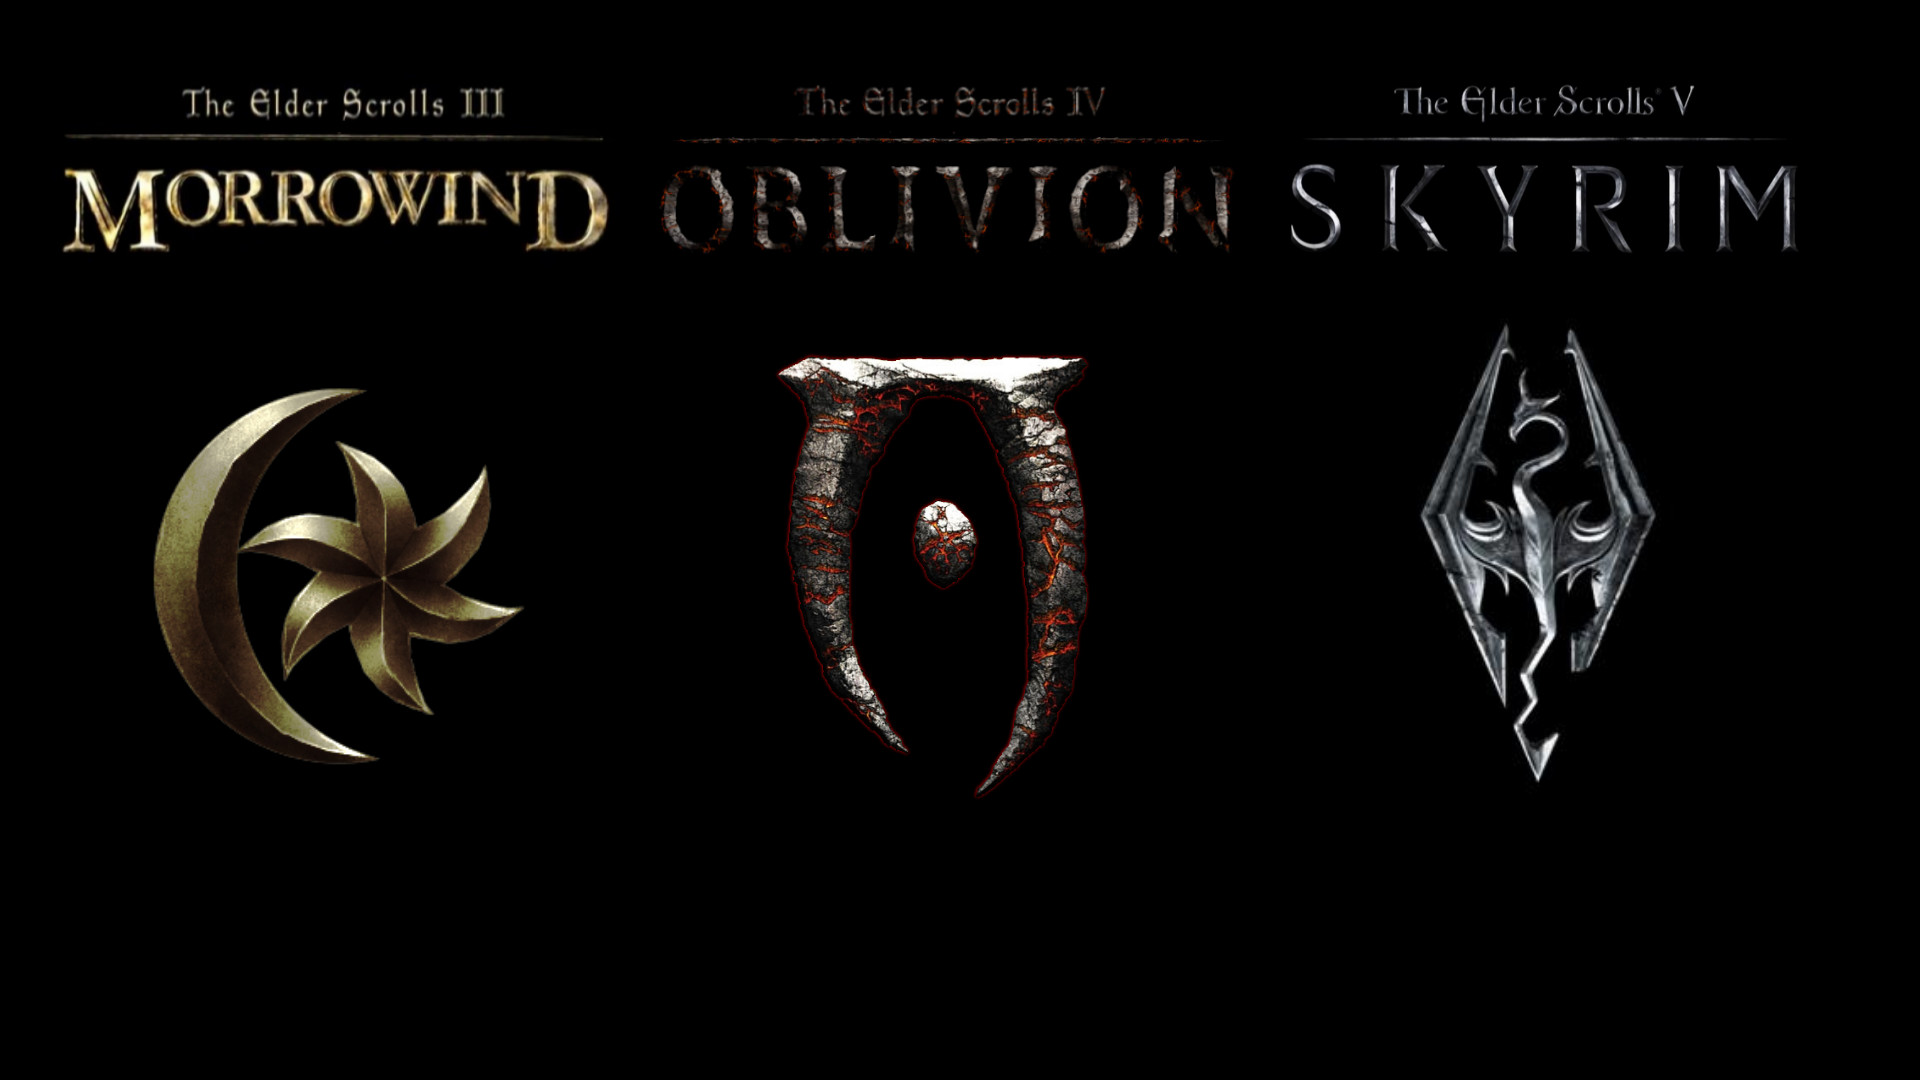 The Elder Scrolls, The Elder Scrolls V: Skyrim, The Elder Scrolls IV: